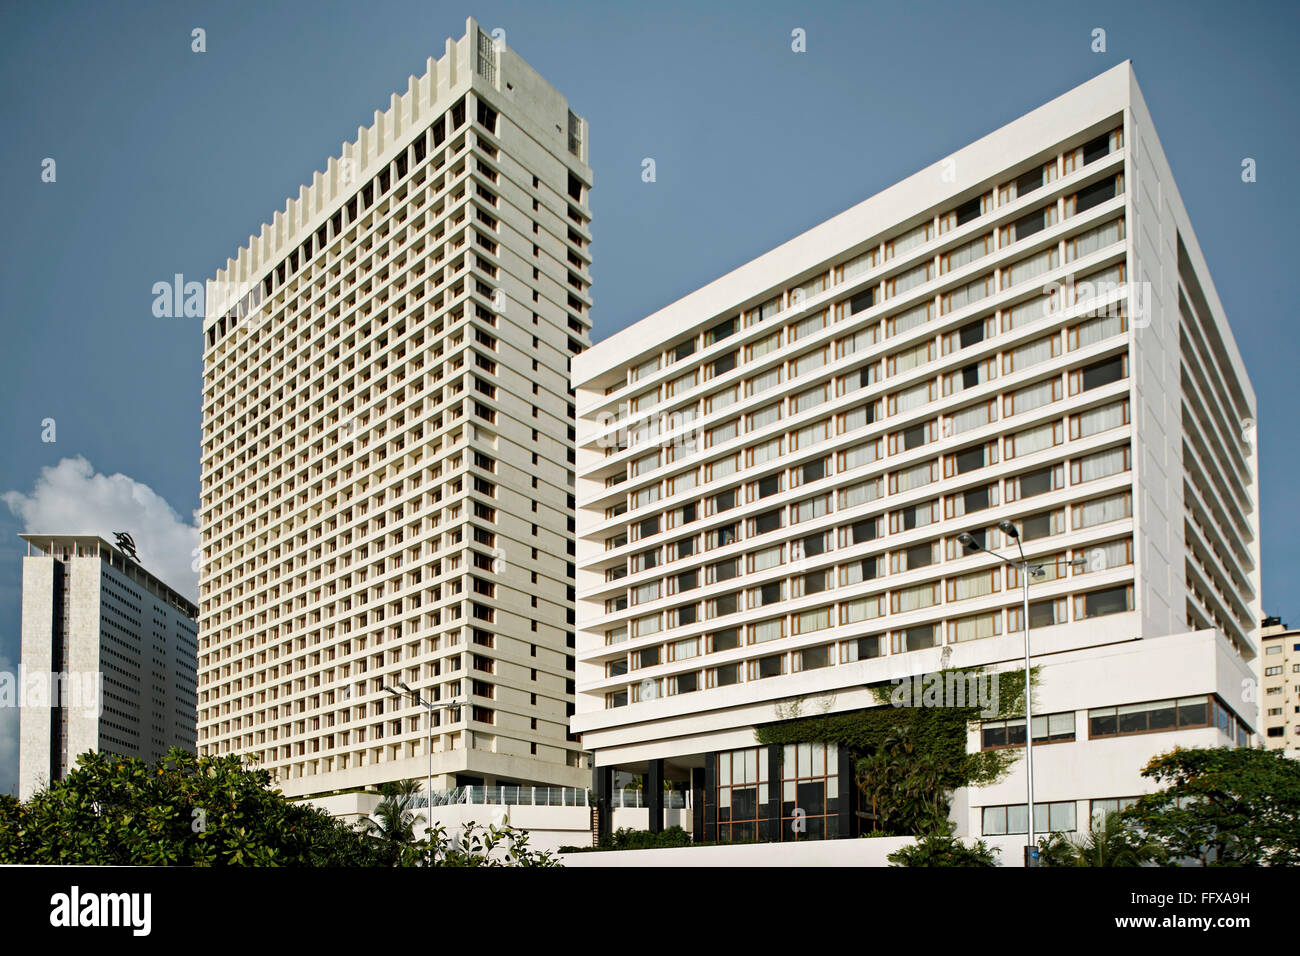 Air India building and Hilton Hotel at Bombay Mumbai